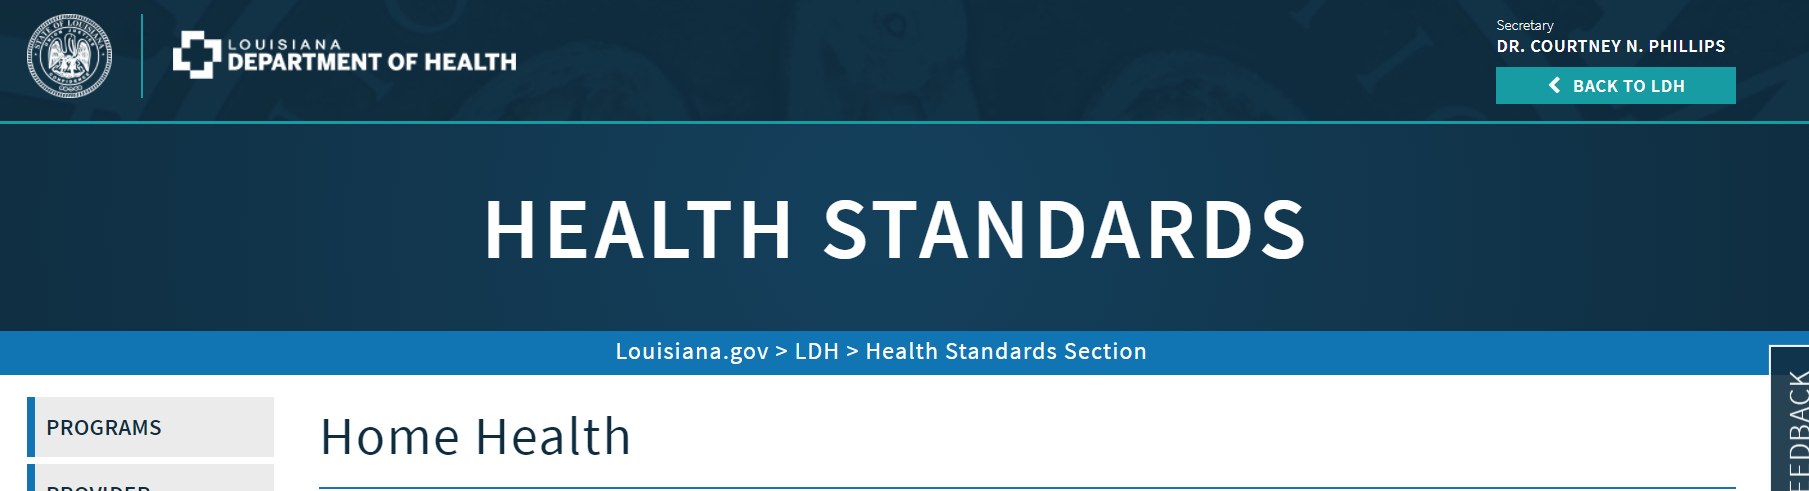 Louisiana Home Health